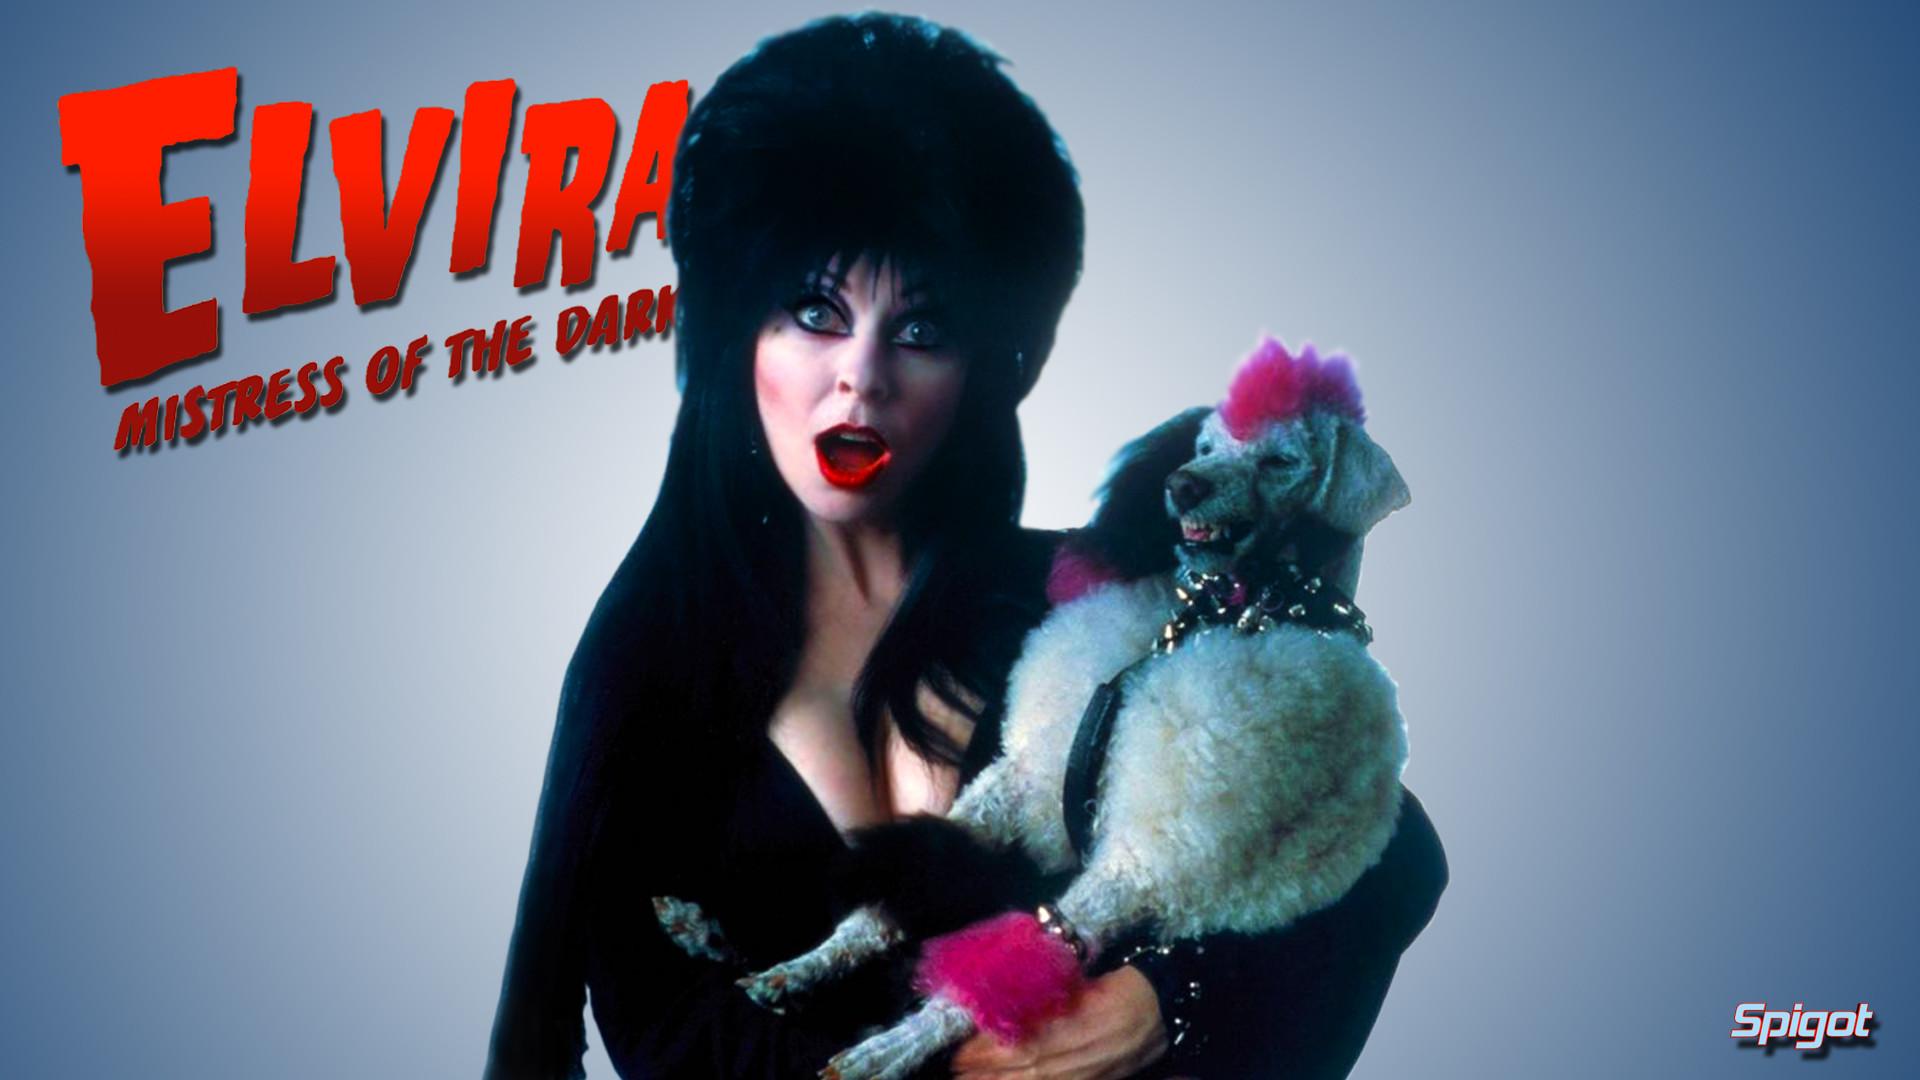 elvira, mistress of the dark, film, television, horror   CHCHCH AHAHAH    Pinterest   Cassandra peterson, Horror and Televisions